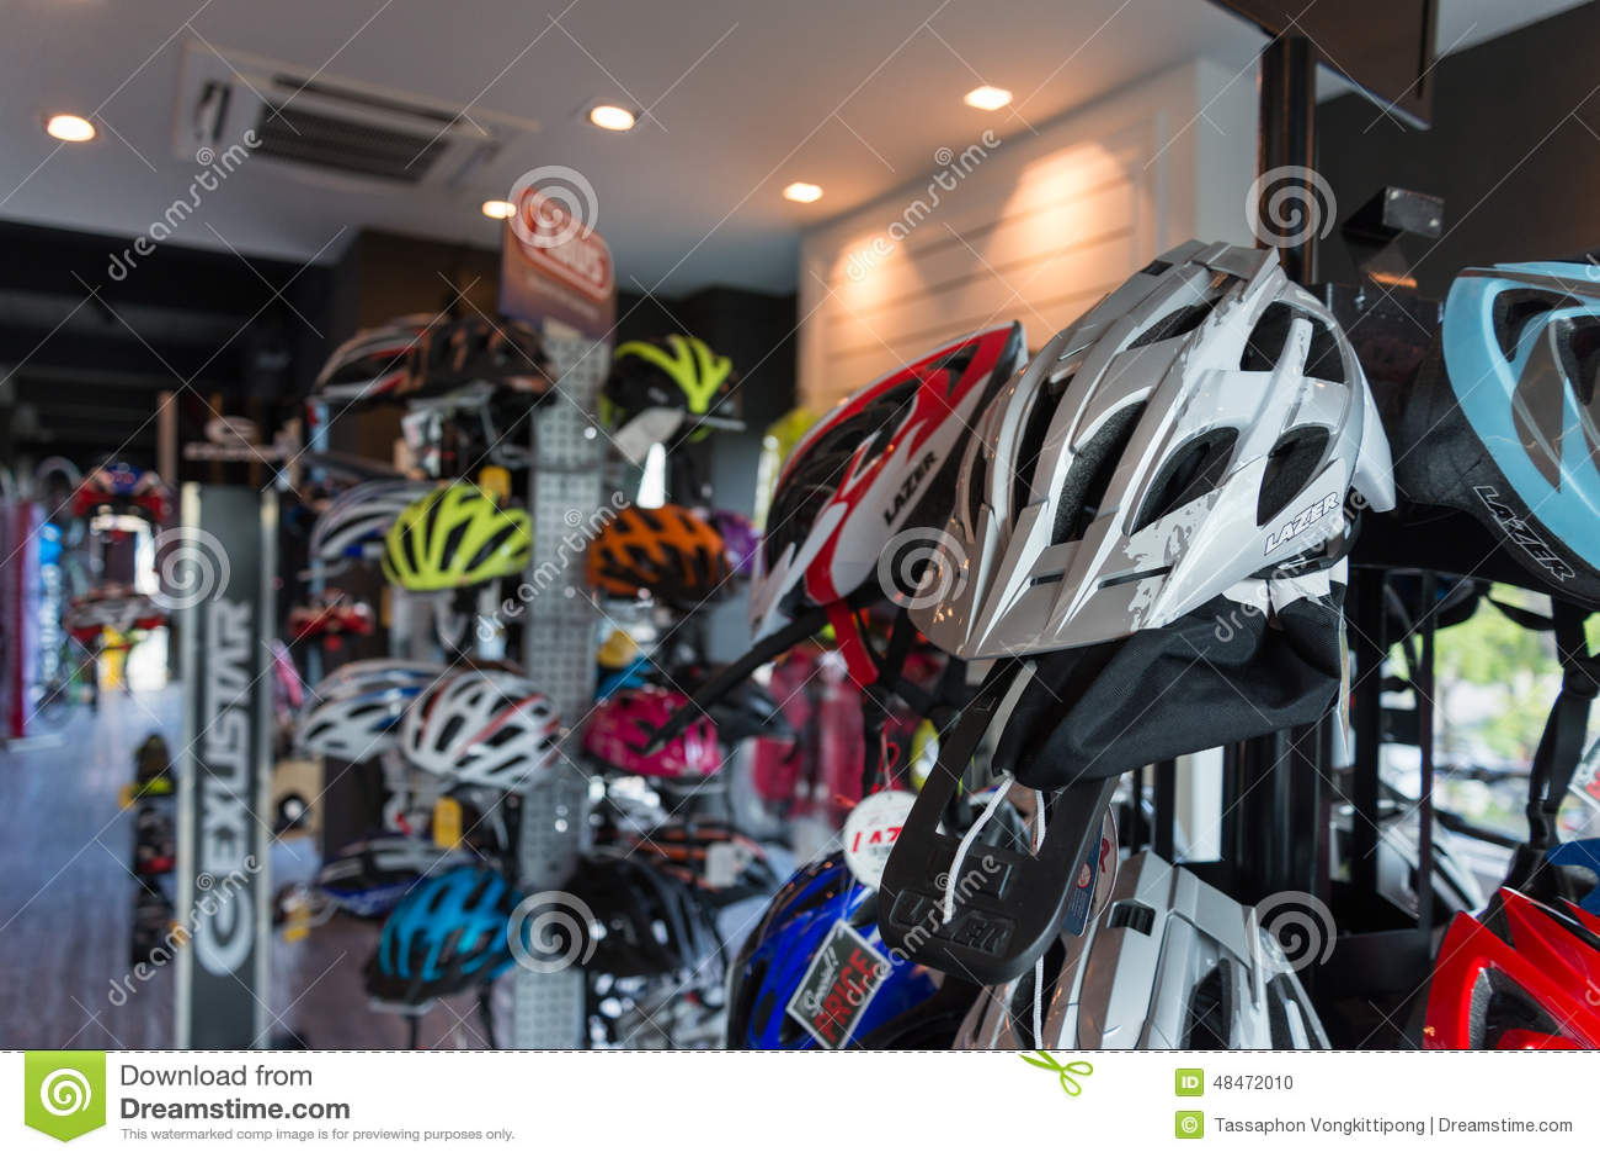 Thailand bicycle shop online